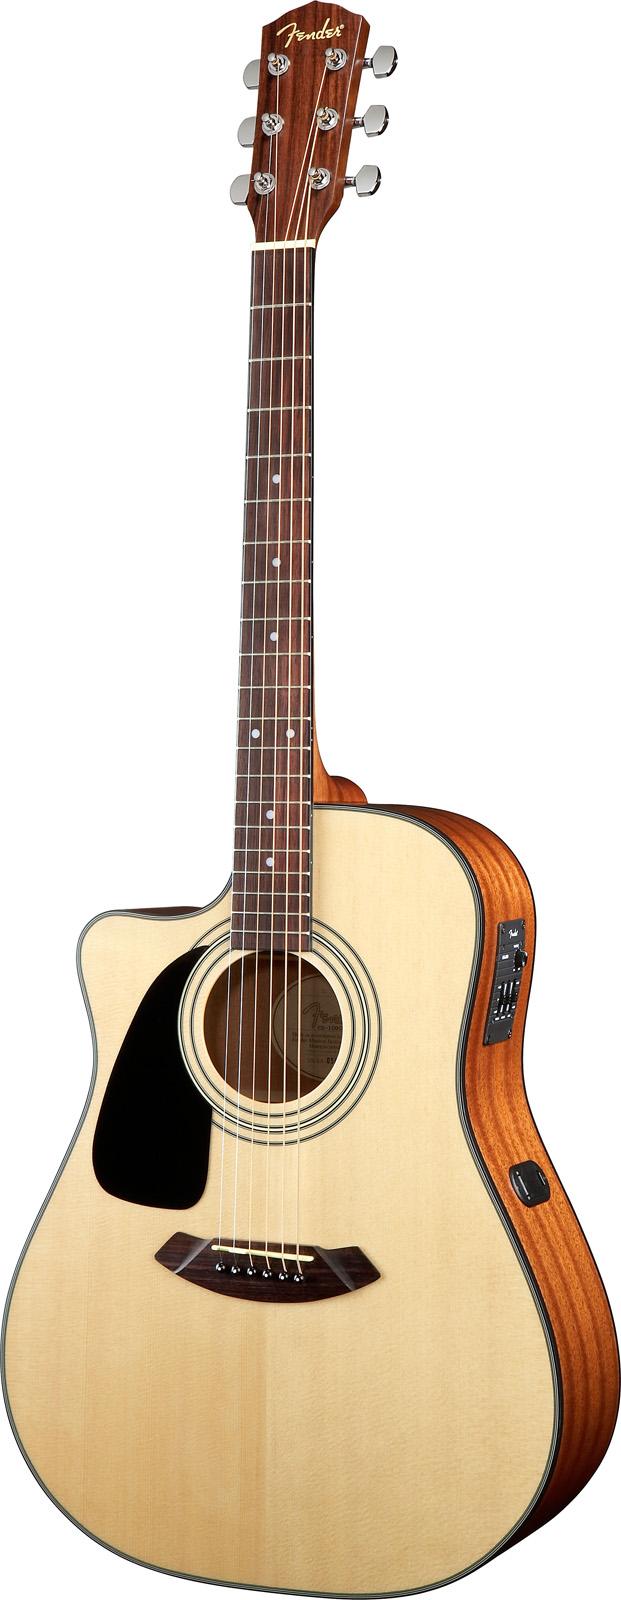 Fender Gaucher Cd 100ce L/h V2 Natural